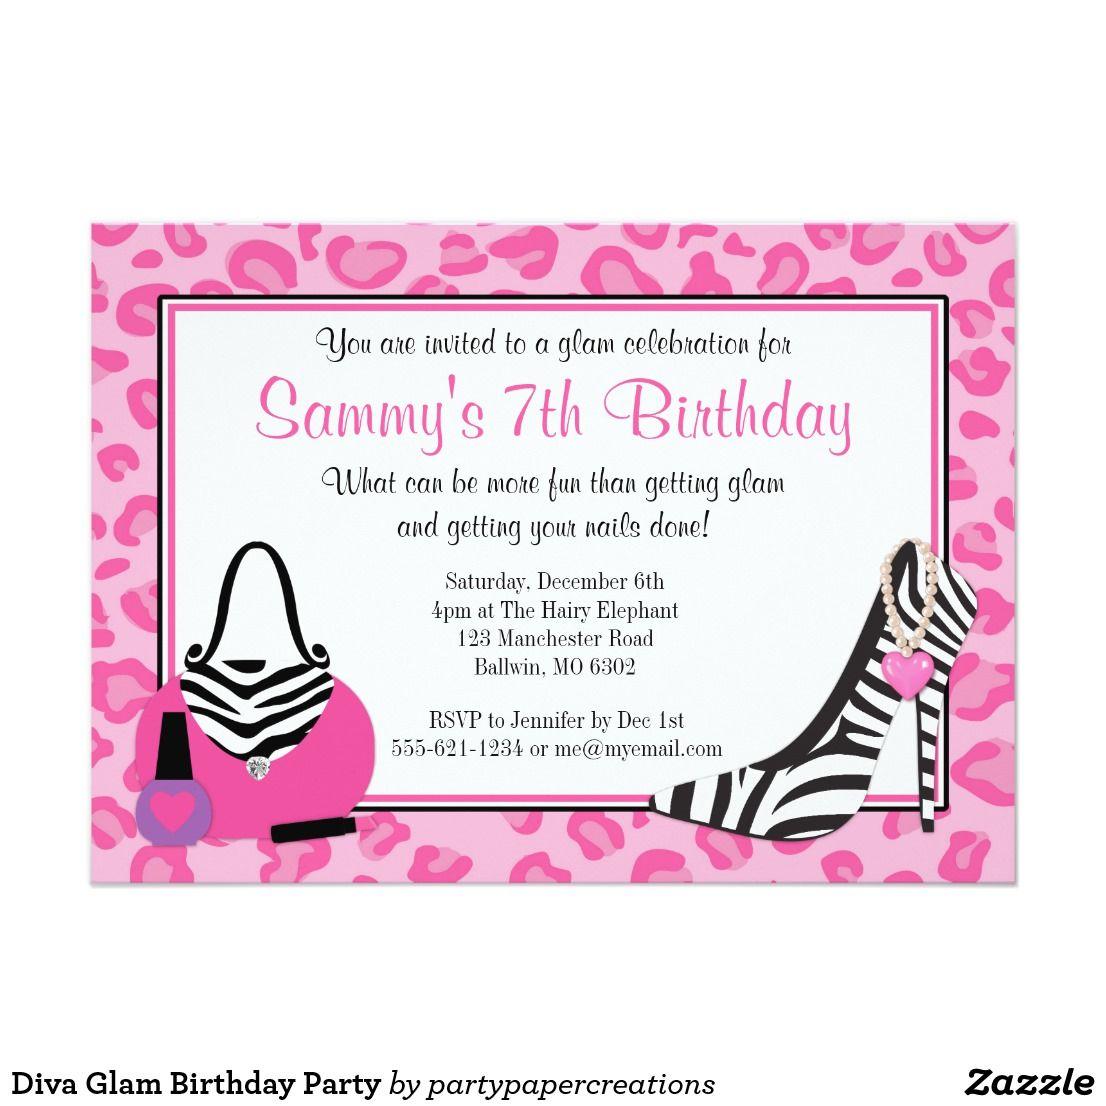 Diva Glam Birthday Party Invitation | { Happy Birthday - Invitations ...